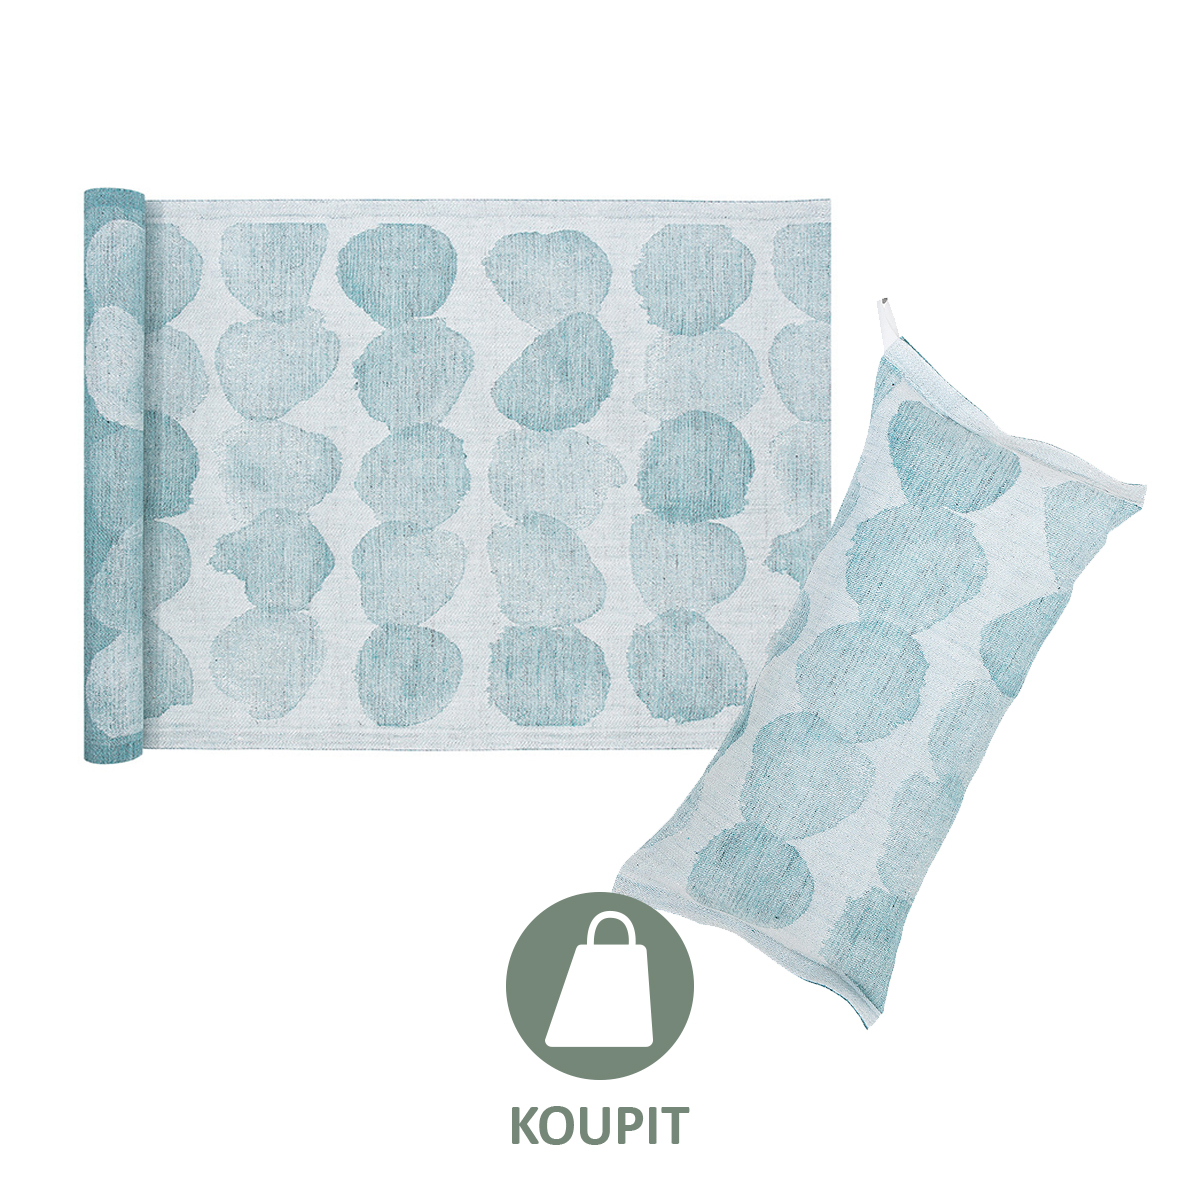 nova-finska-znacka-lapuan-kankurit-produkt8